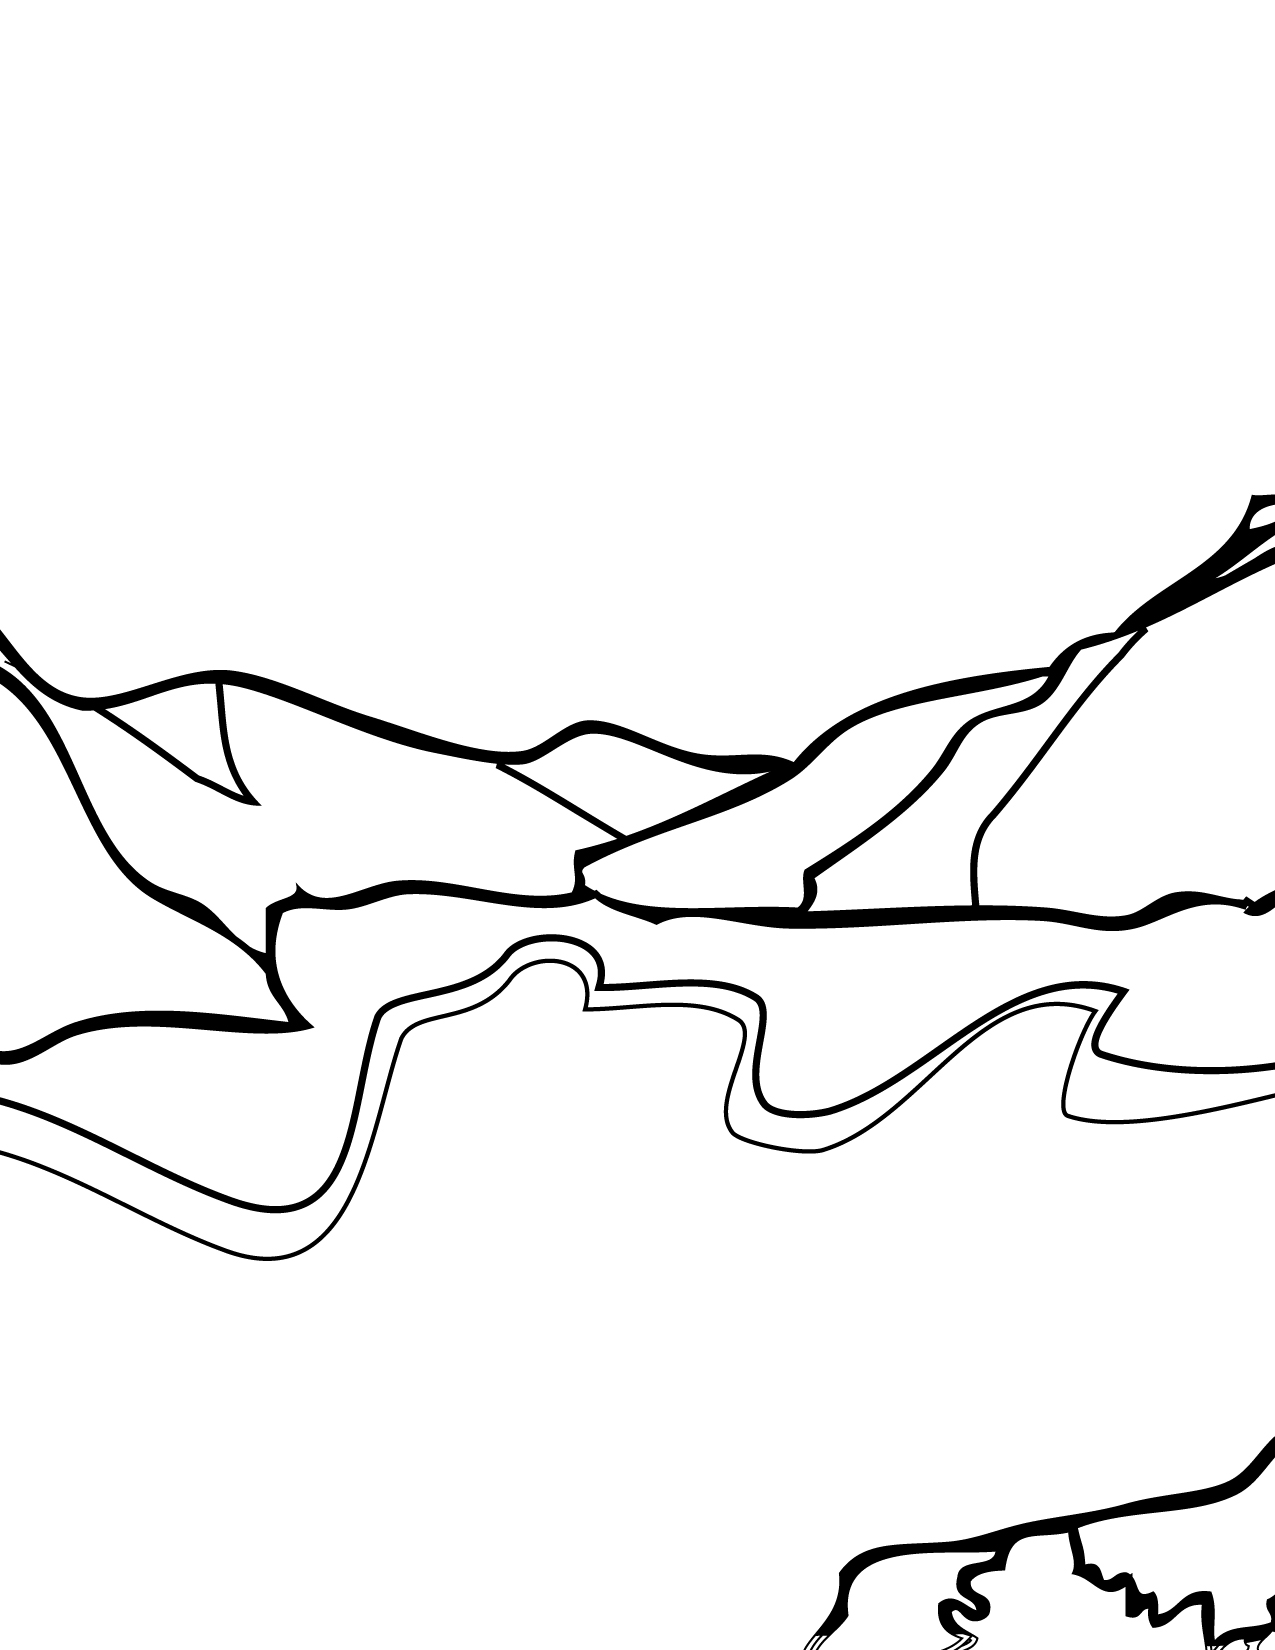 Download Glacier Coloring For Free